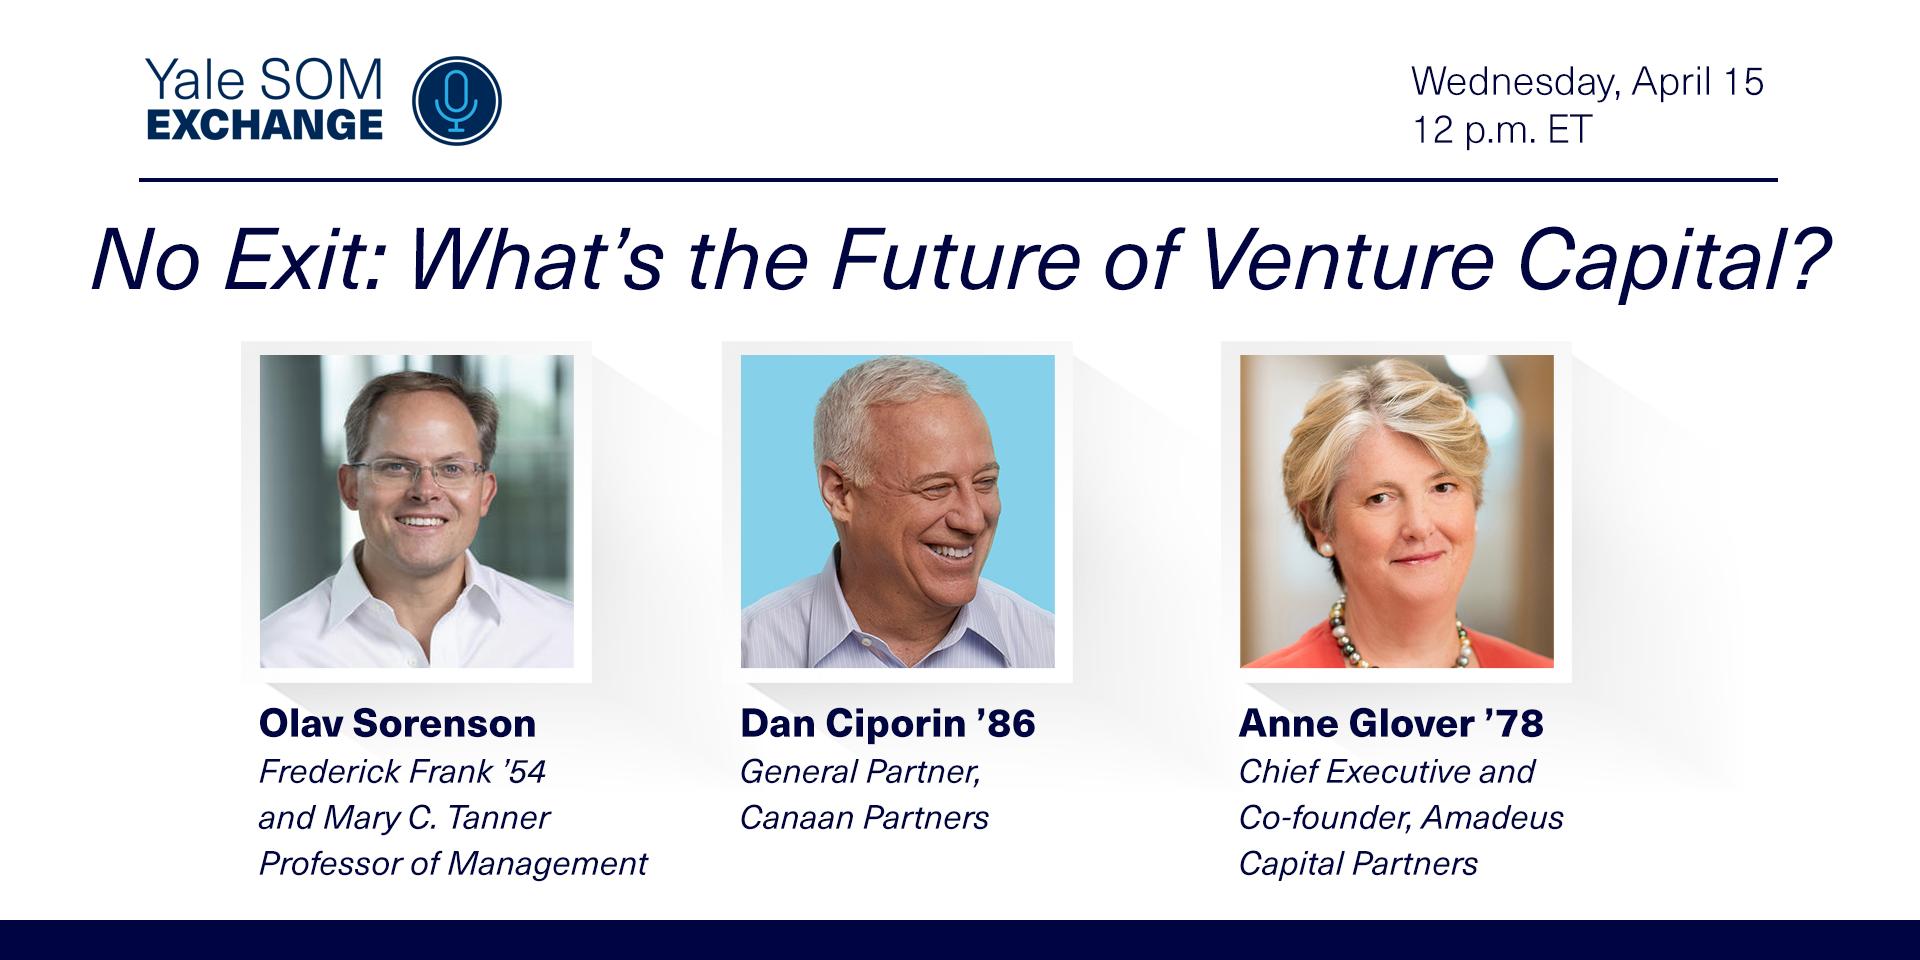 [WEBINAR] No Exit: What's the Future of Venture Capital?